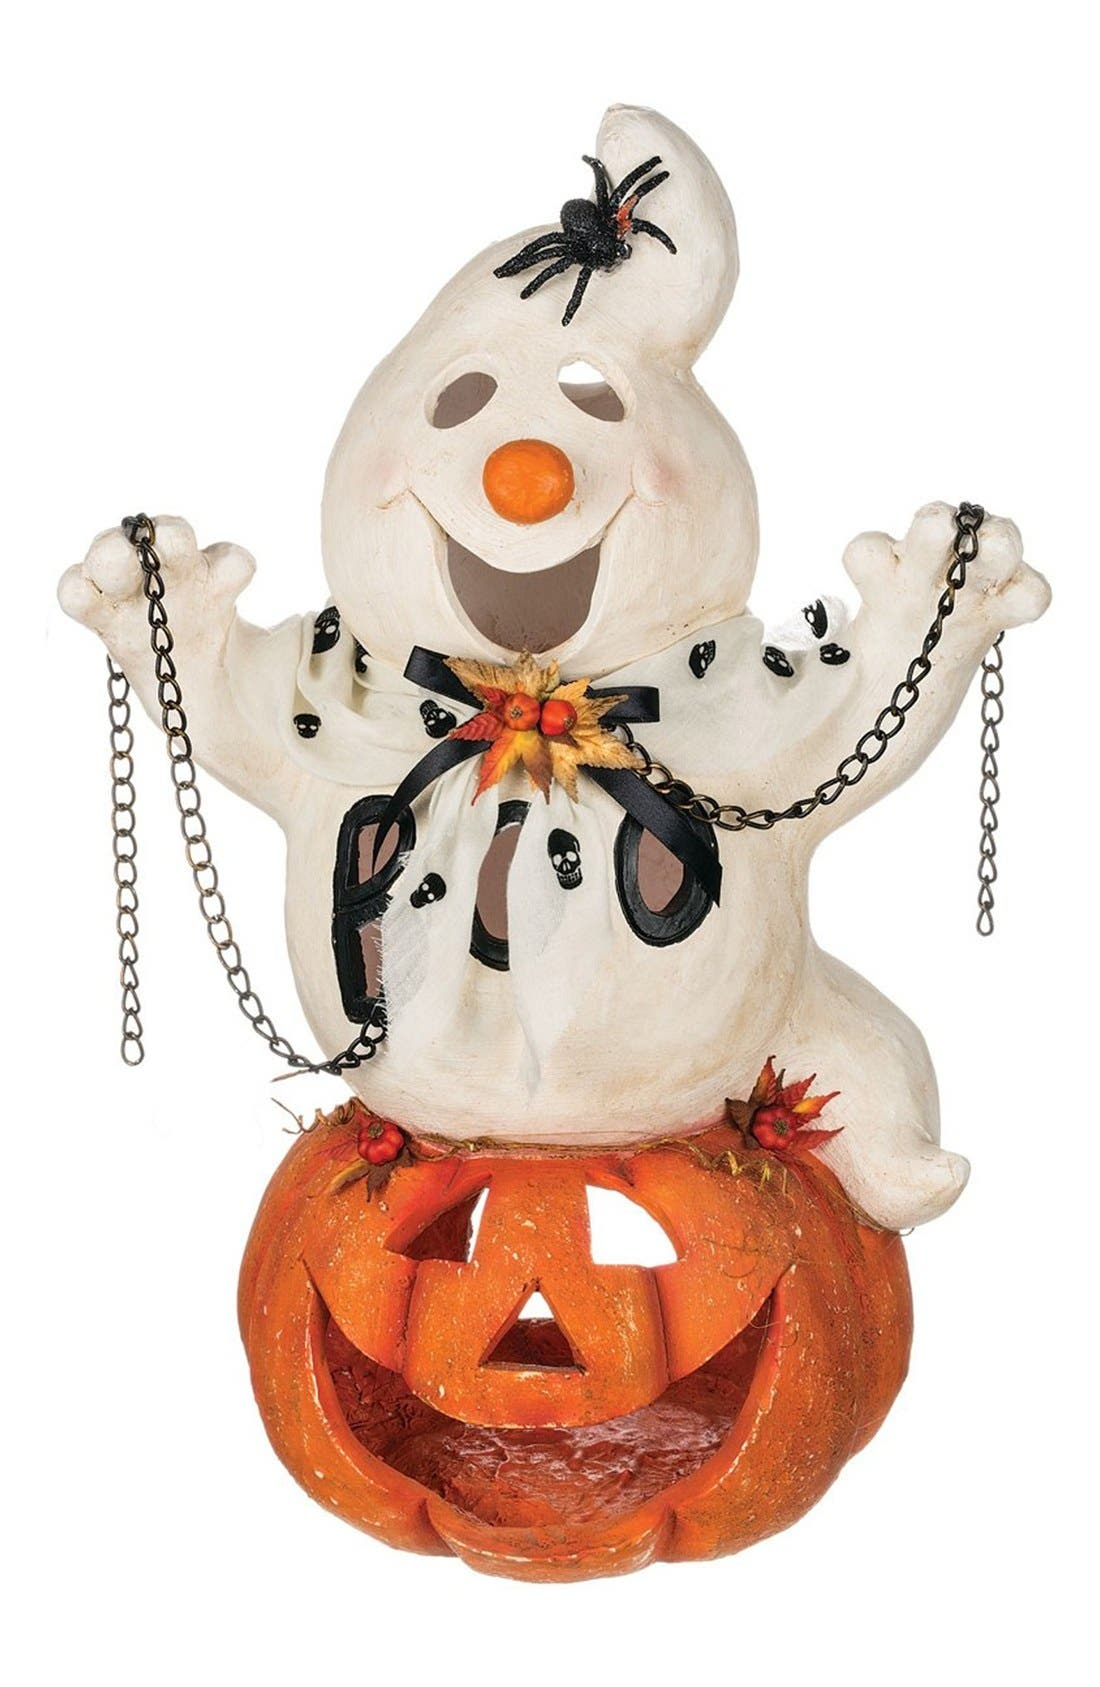 Sullivans 'Ghost & Jack O' Lantern' Halloween Decoration